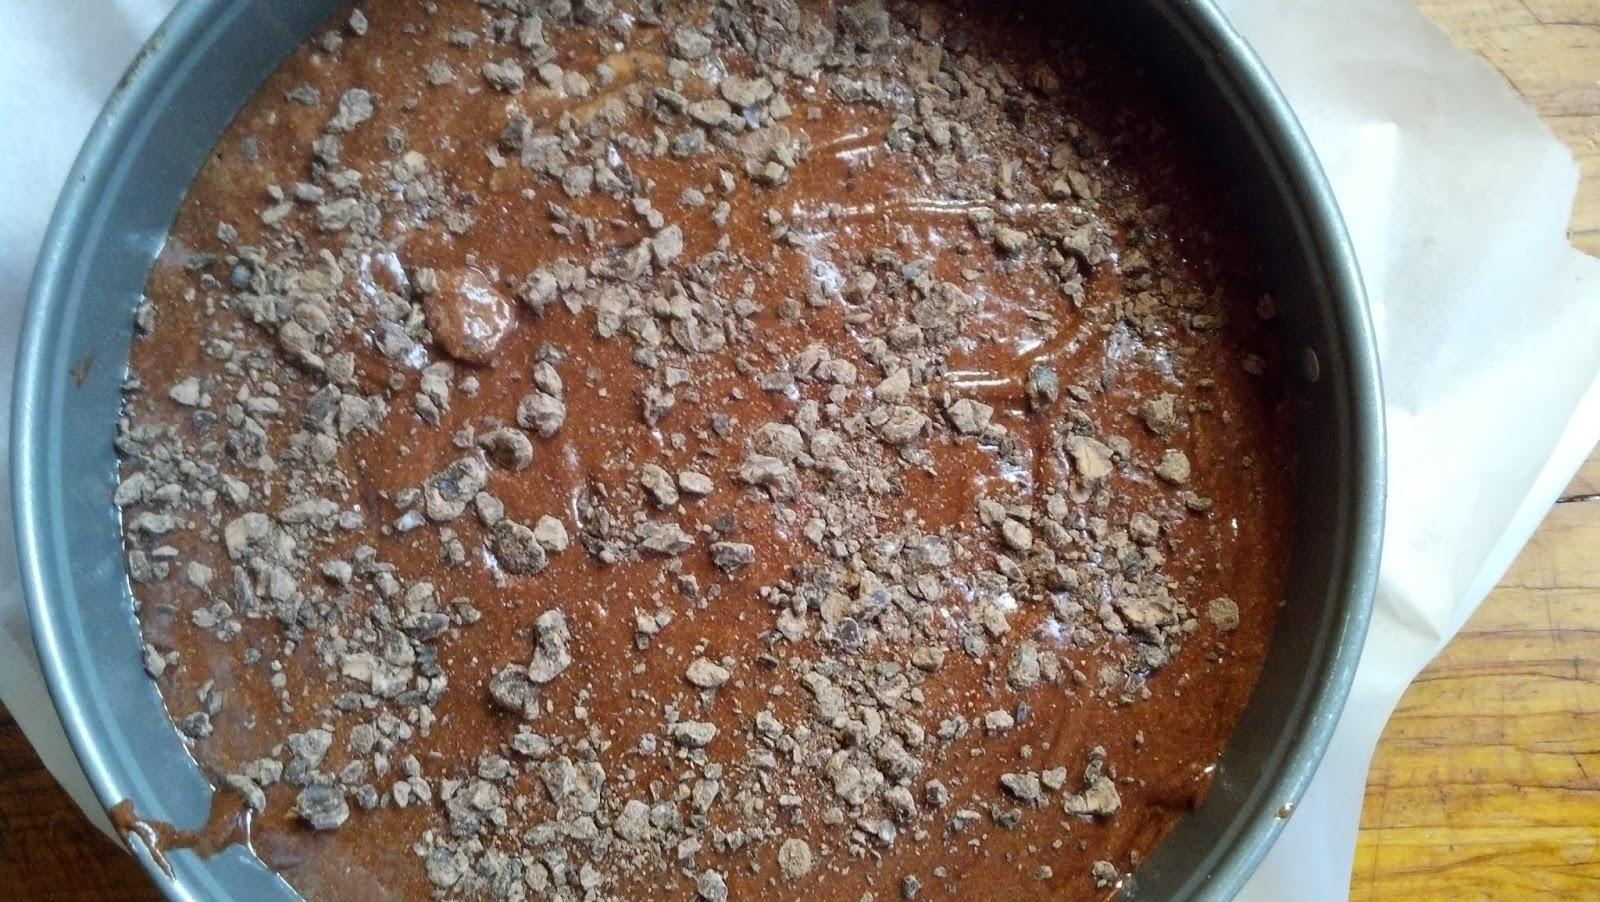 Flourless Chocolate Cake With Cocoa Nibs